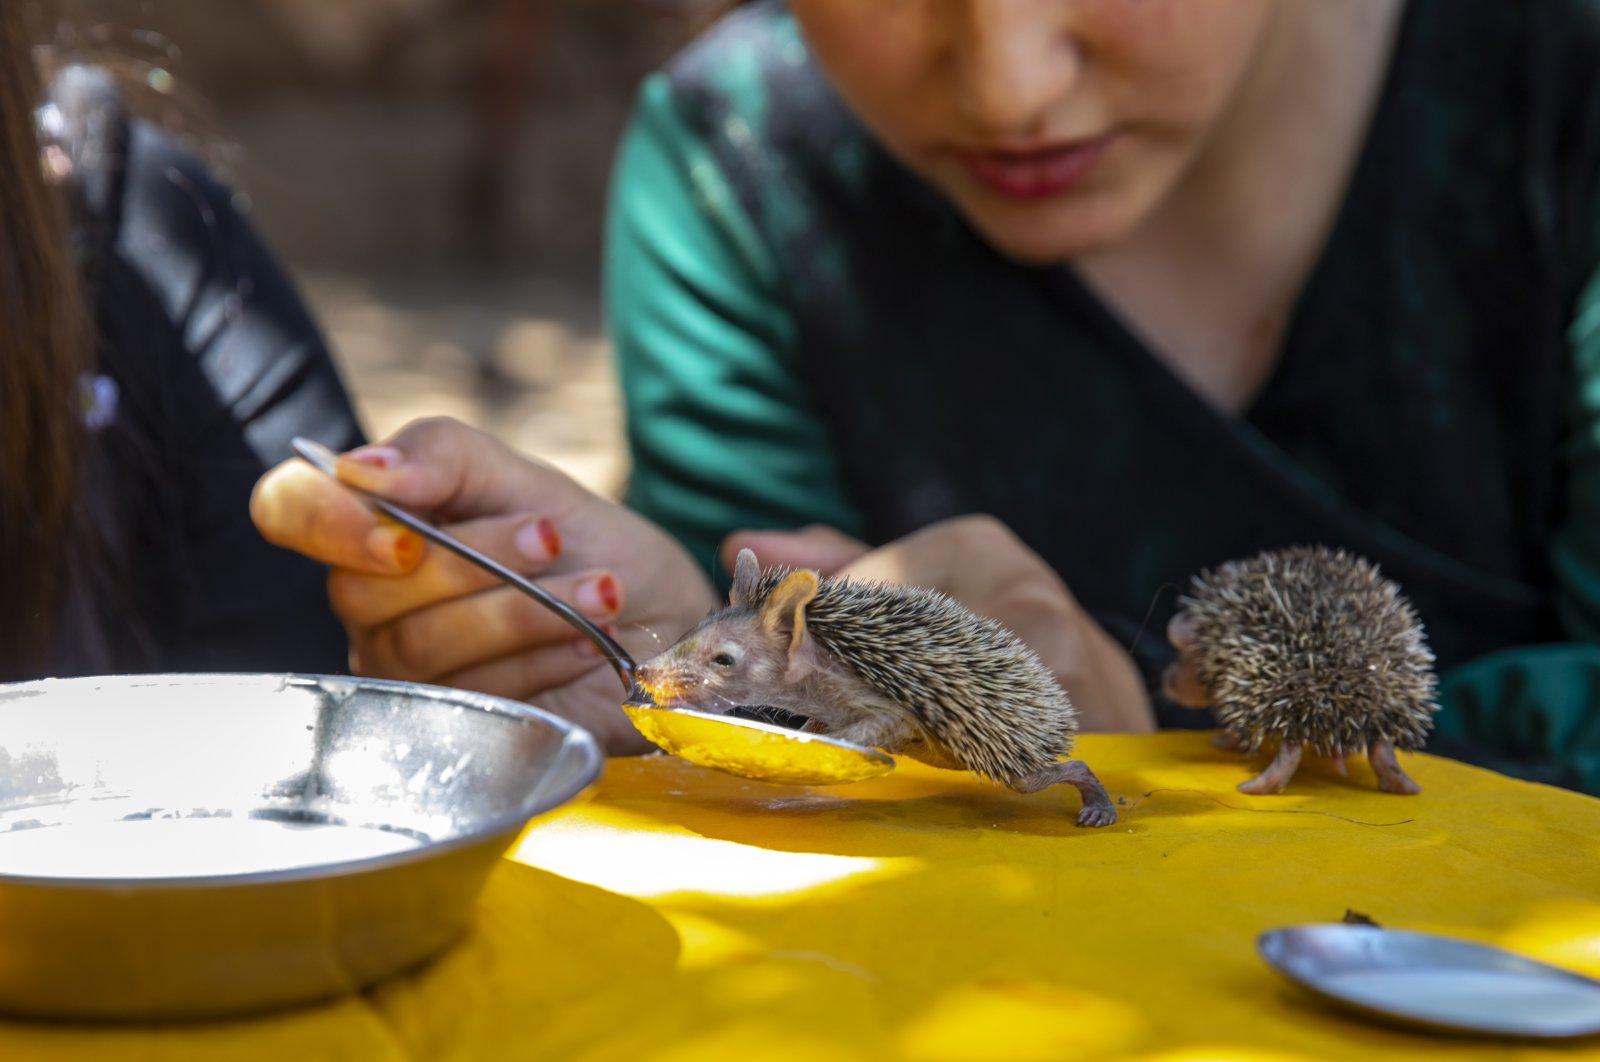 The Süer children feed the baby hedgehogs in Diyarbakır, southeastern Turkey, July 8, 2021. (AA PHOTO)